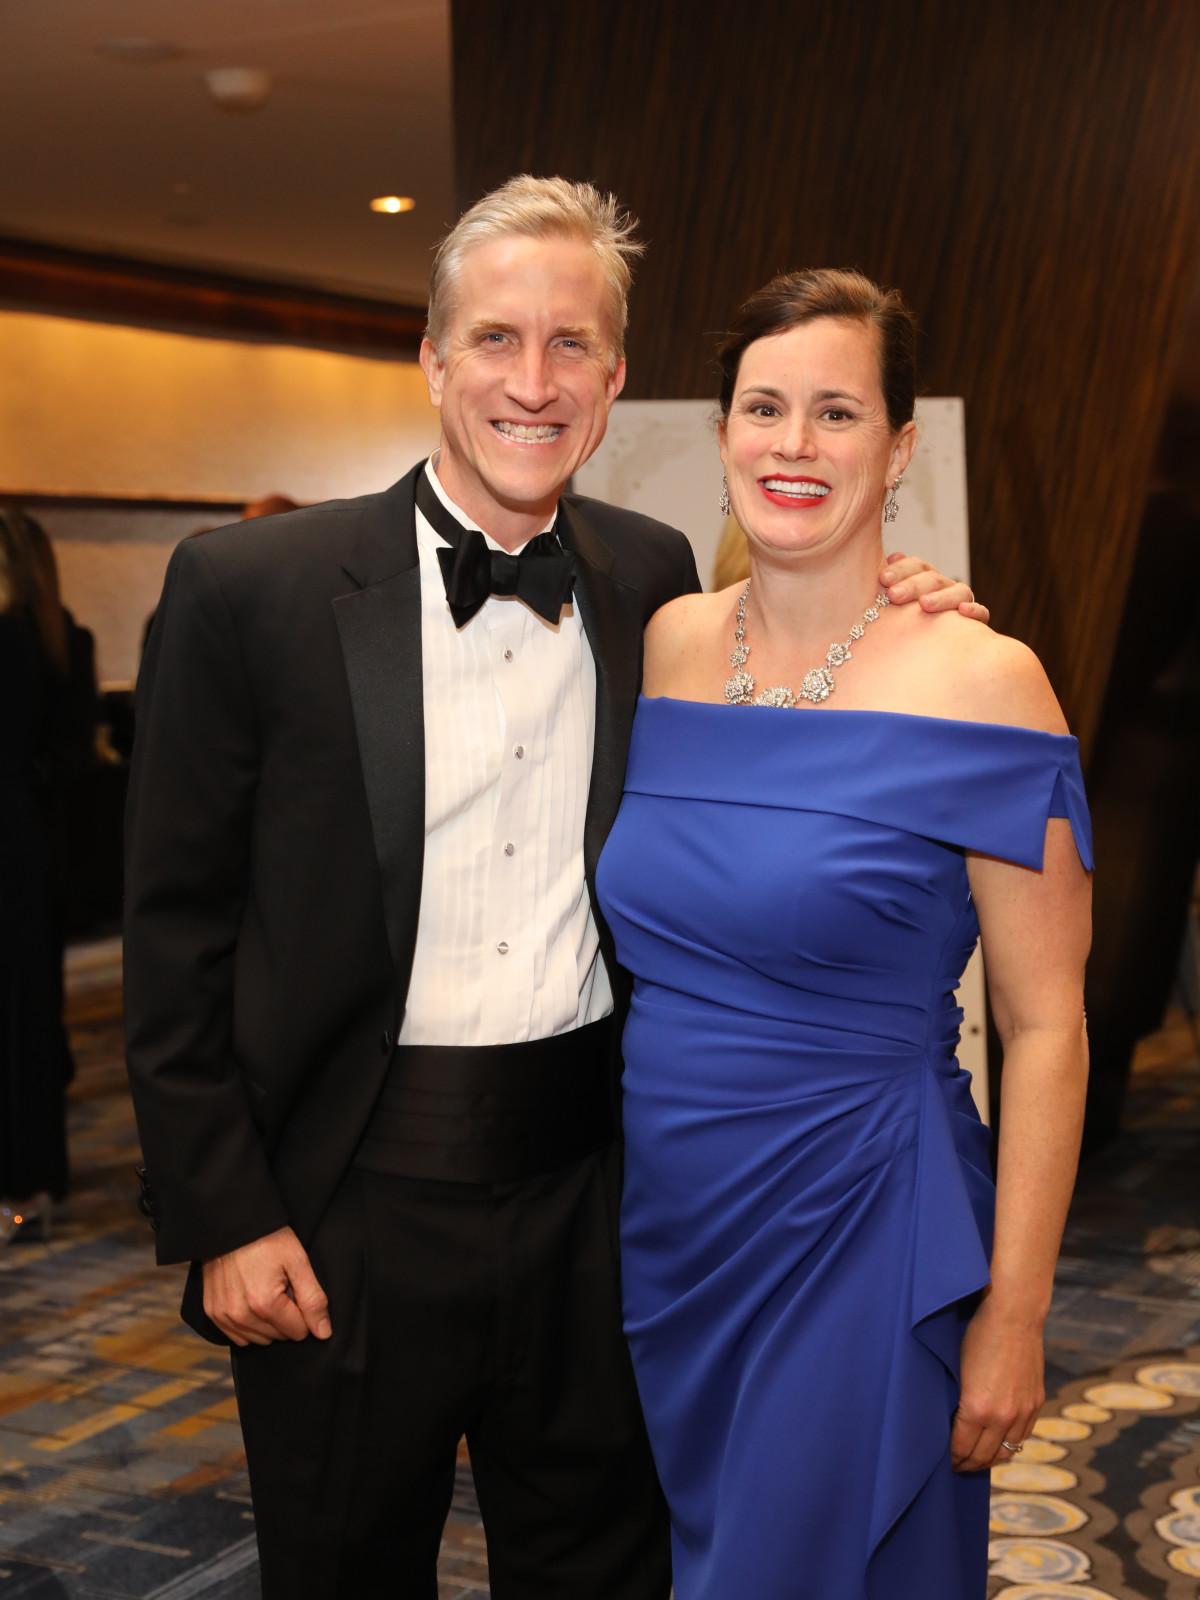 Heart Ball 2020 Brett Clanton and Beth Lousteau